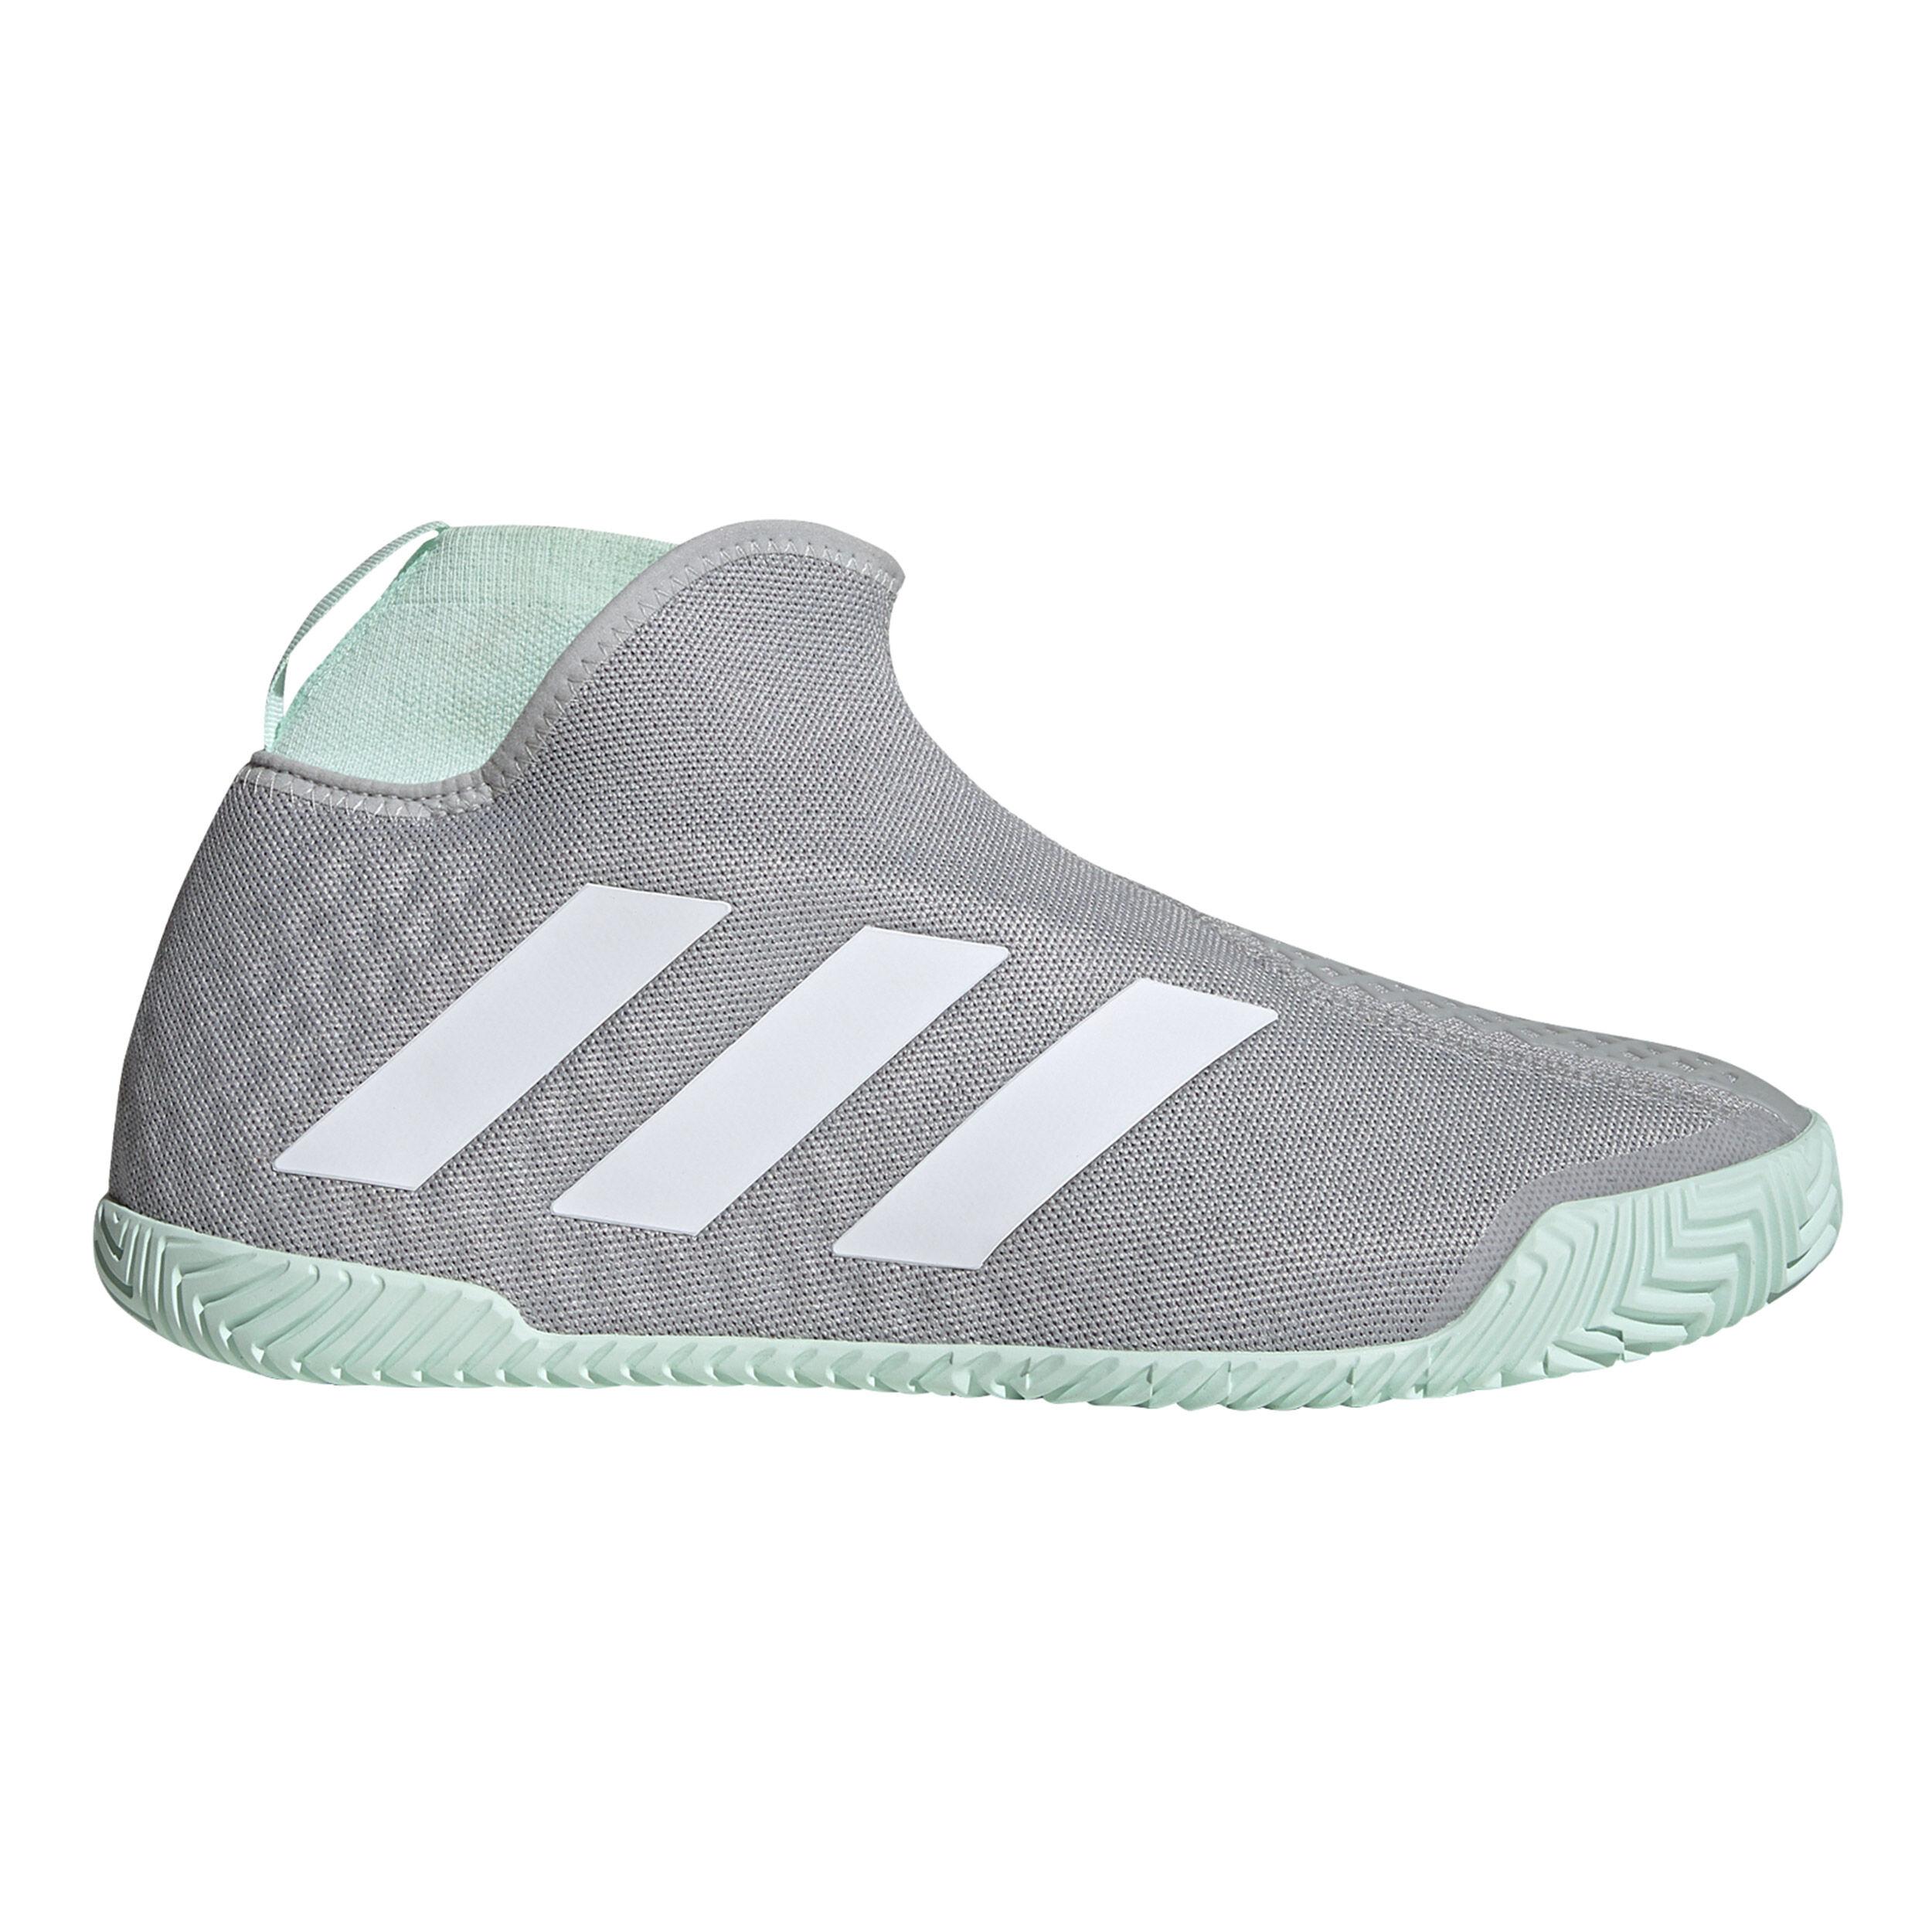 adidas Stycon Allcourt sko Herrer Lysegrå, Mint køb online